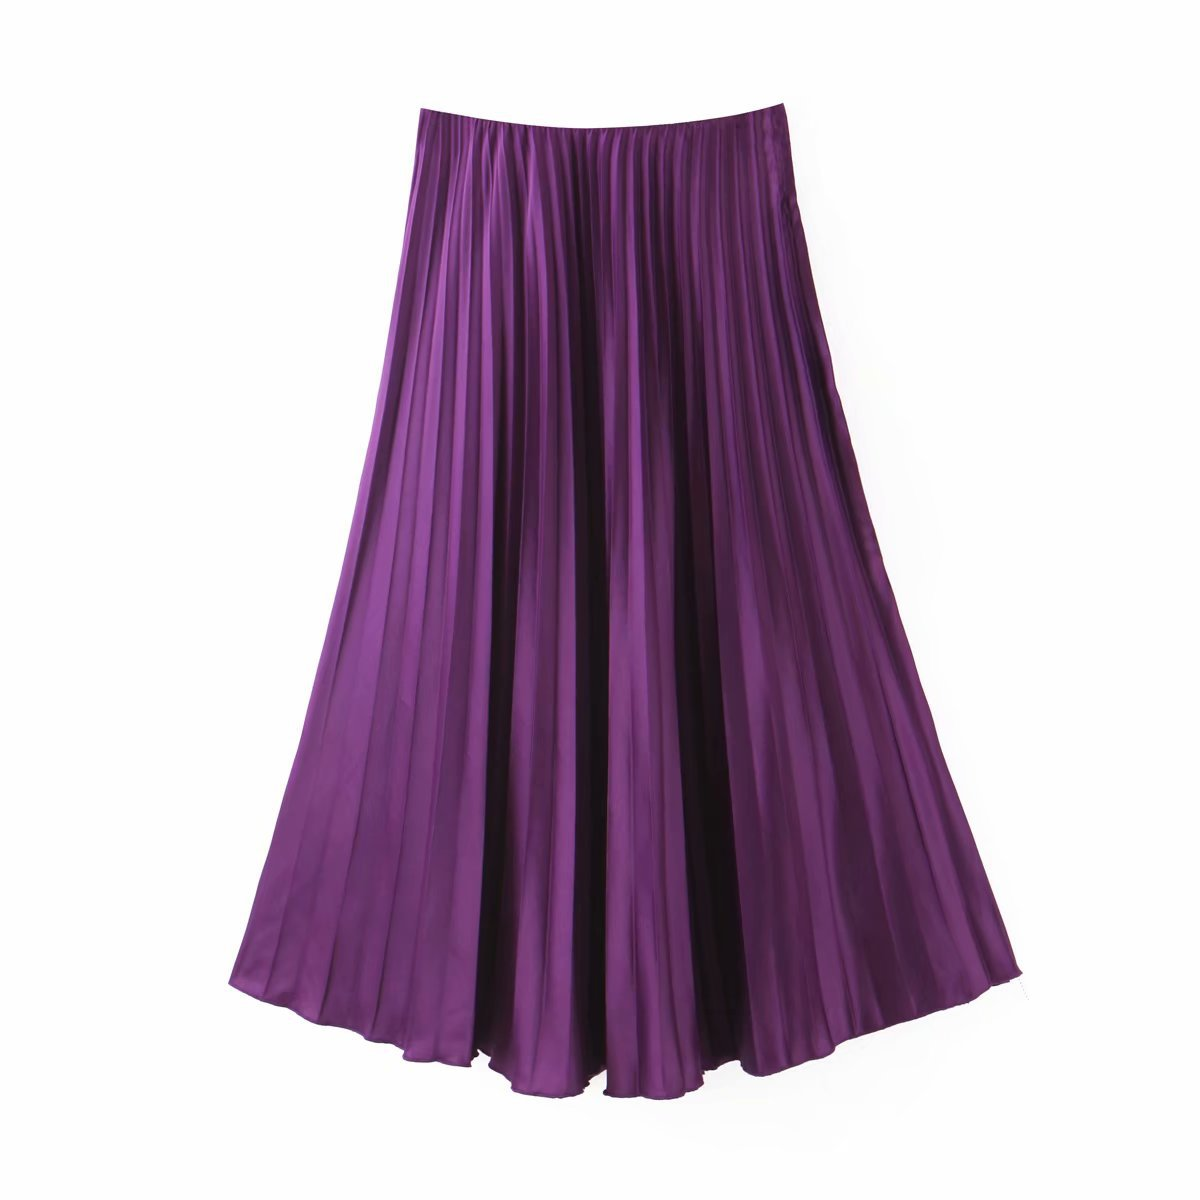 Women Elegant Purple Pleated Skirt Elastic Waist Basic Solid Midi Skirts Female Casual Mid Calf Skirts Mujer